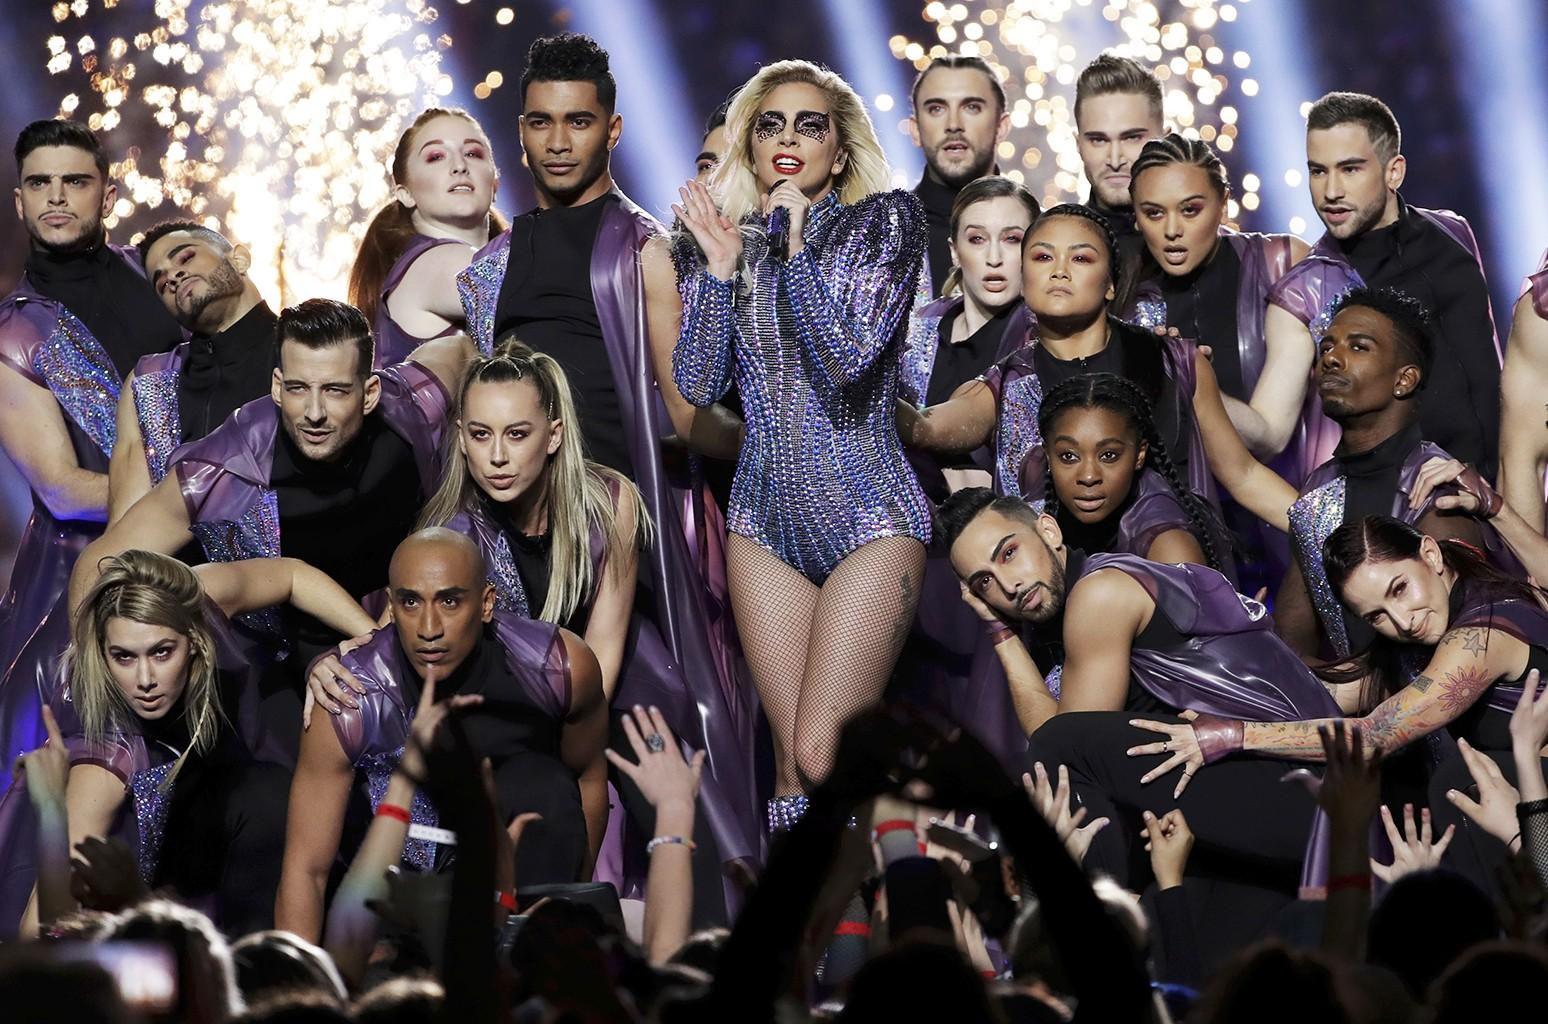 Lady Gaga performs during the Pepsi Zero Sugar Super Bowl 51 Halftime Show at NRG Stadium on Feb. 5, 2017 in Houston.